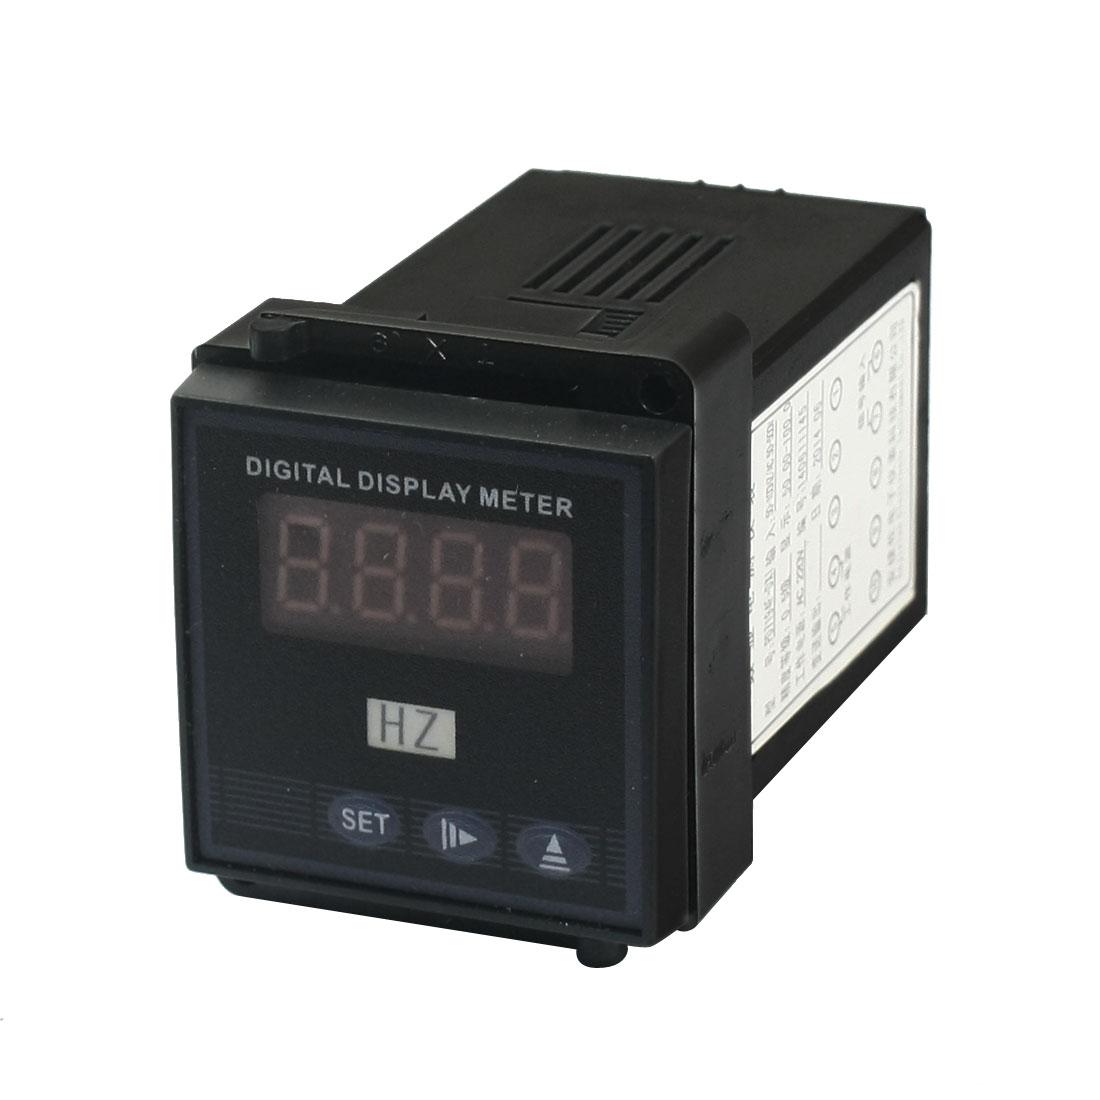 AC220V 50.0-100.0 Panel Mount 10 Screw Terminals Voltage Current Testing Square Programmable 4 Bits LED Digital Display Meter